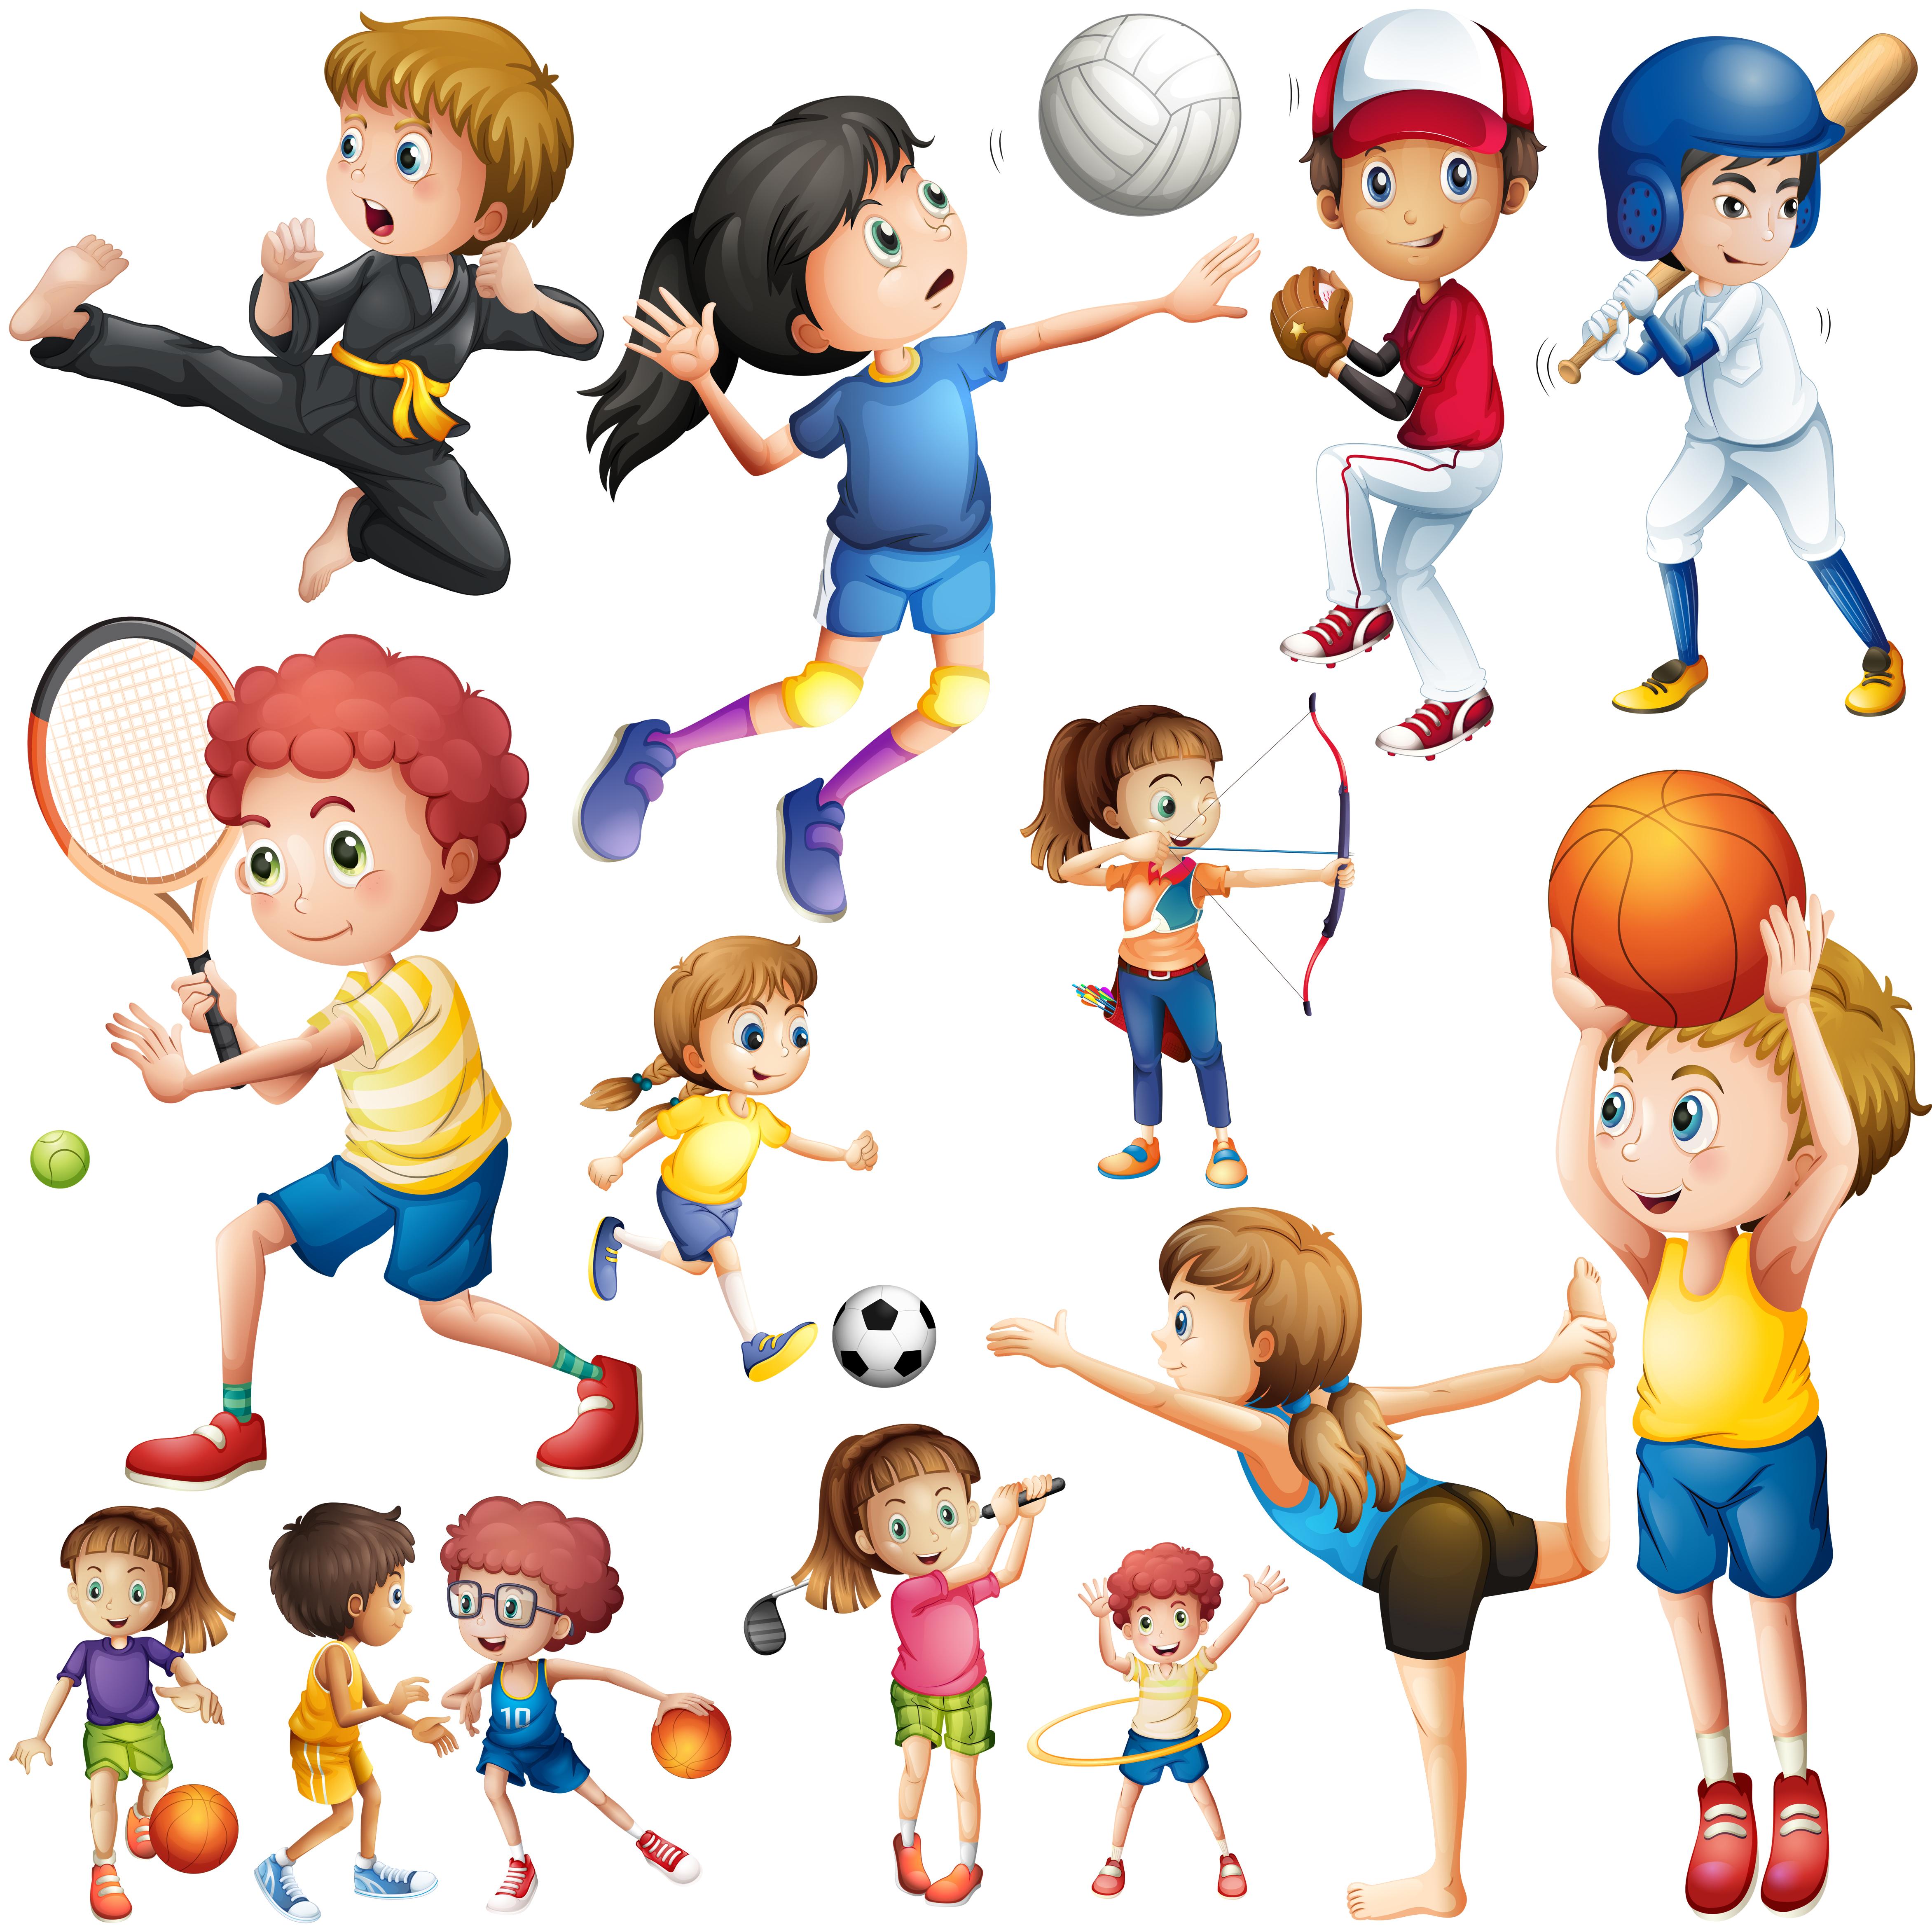 картинки про спорт и физкультуру как фото уфе начинают